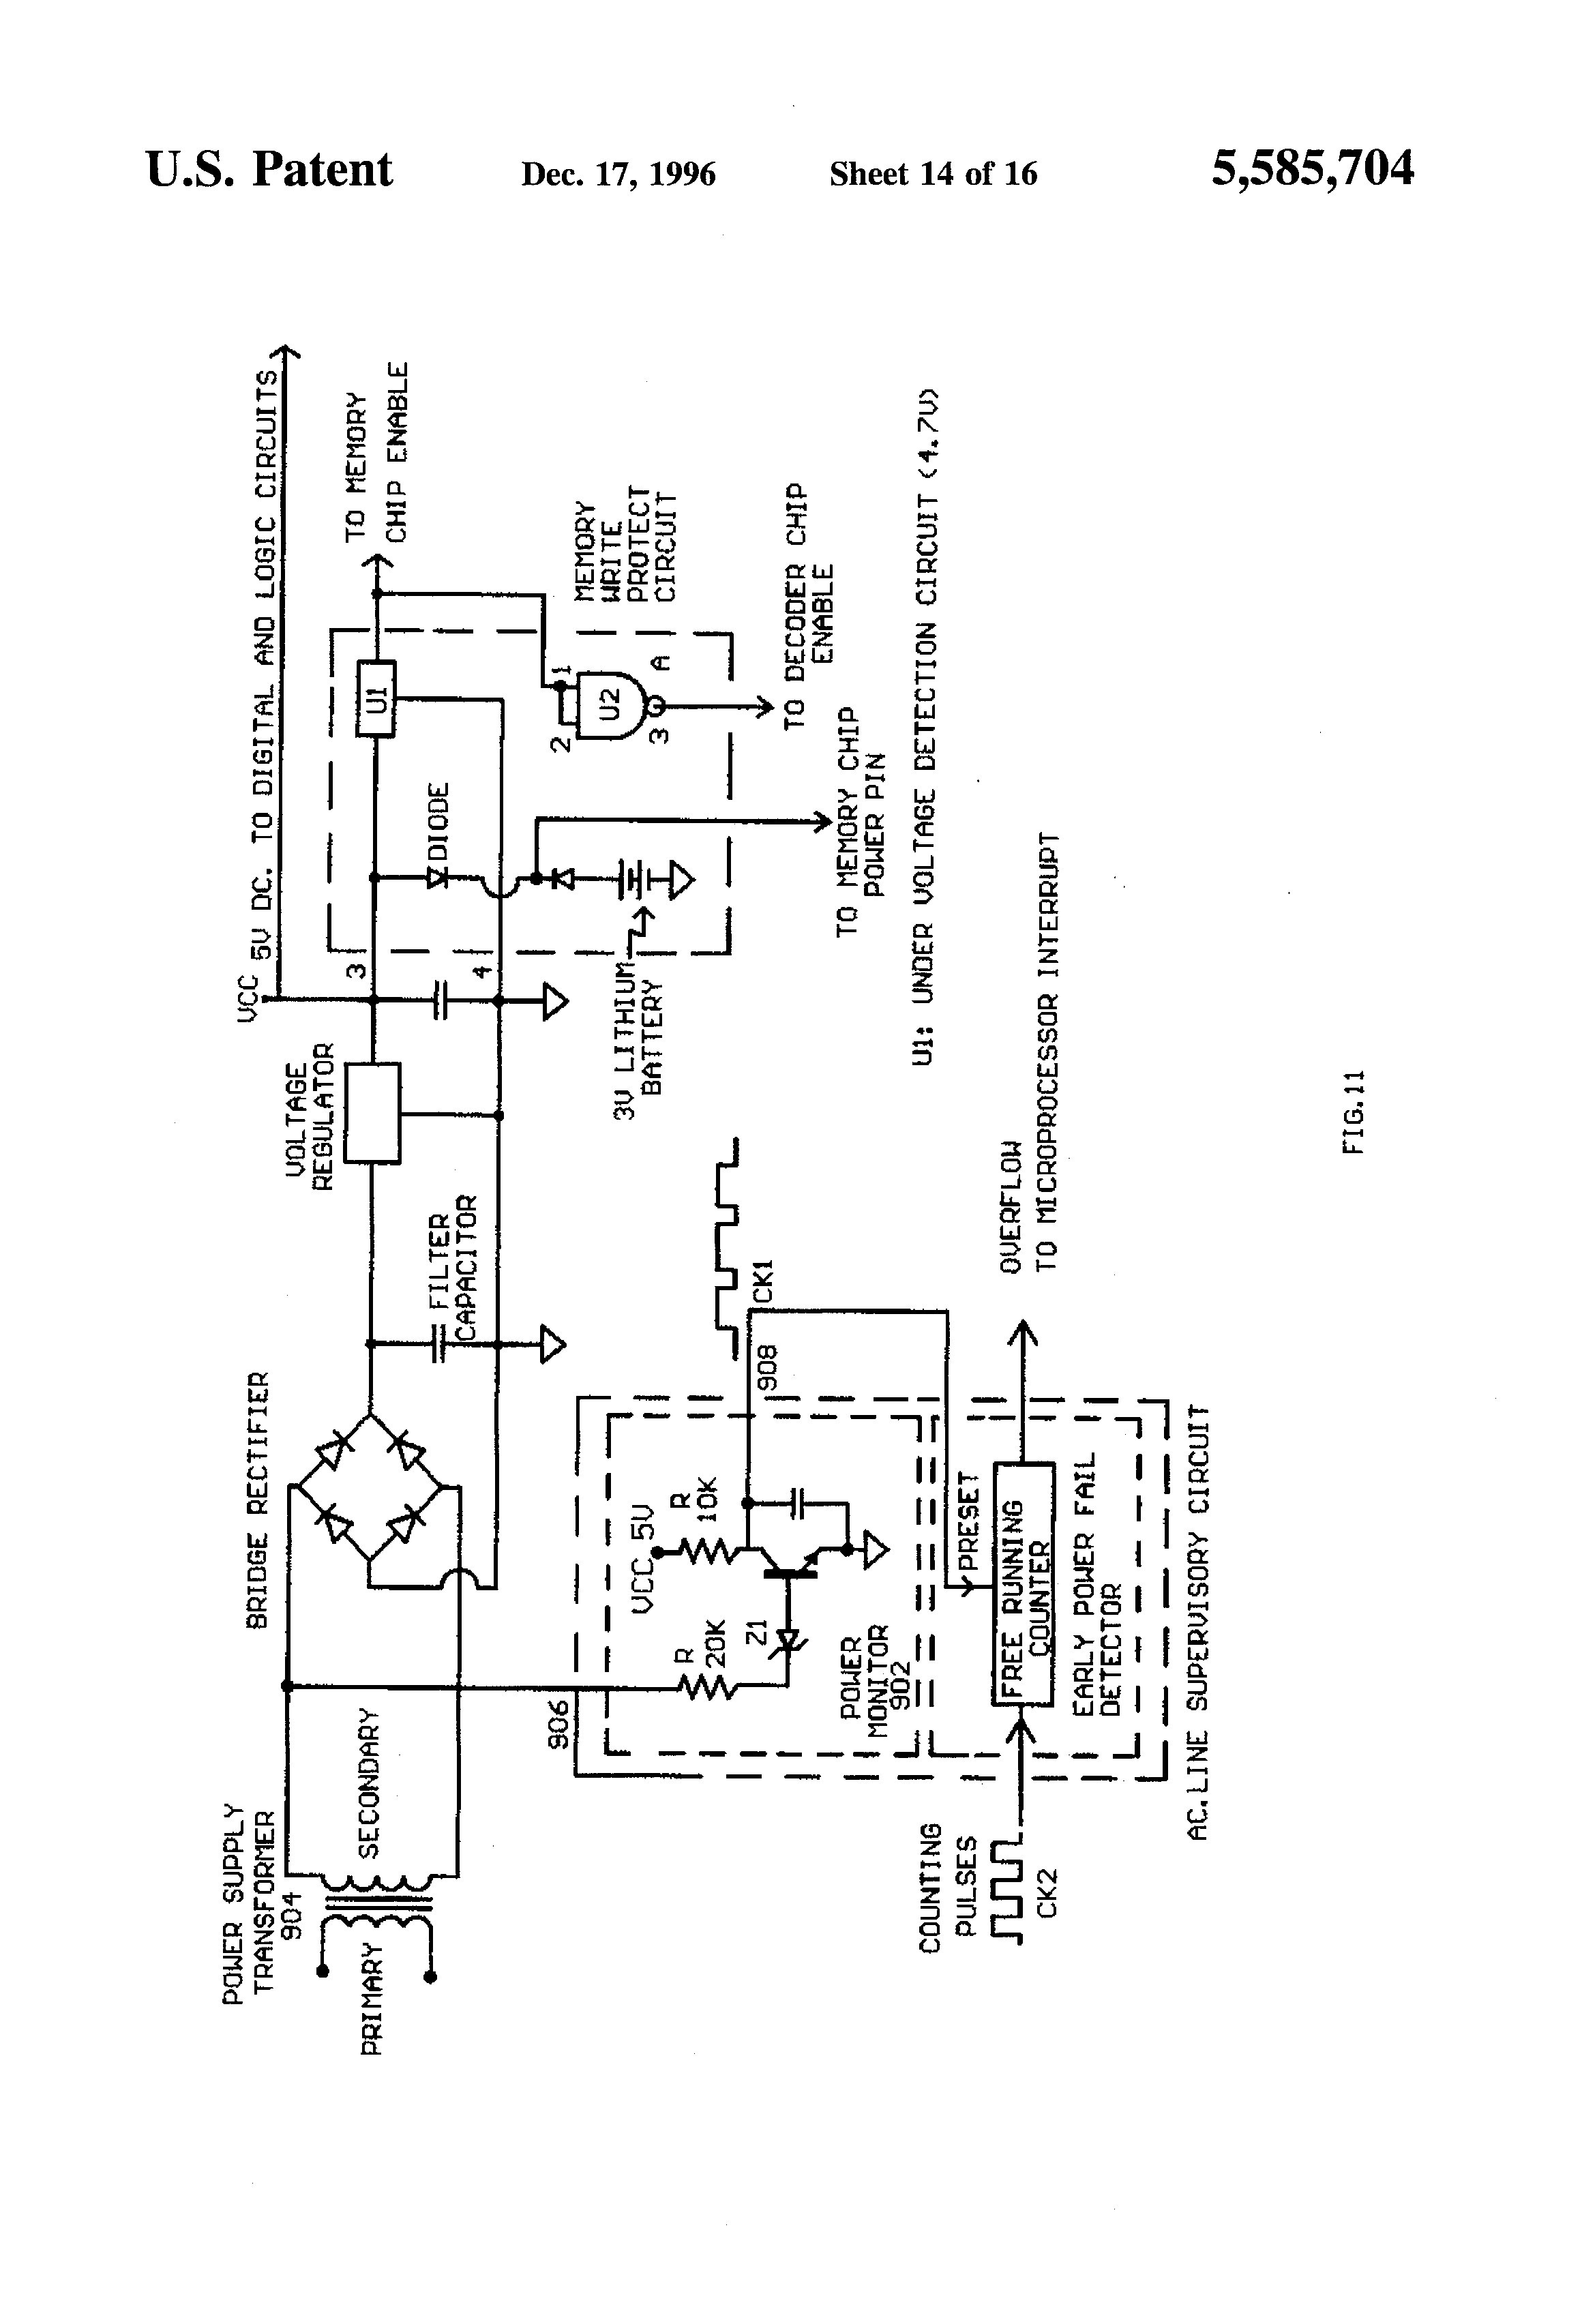 Whirlpool Lgb6200k Dryer Wiring Diagram - Wiring Diagrambenefiz-golfen.de